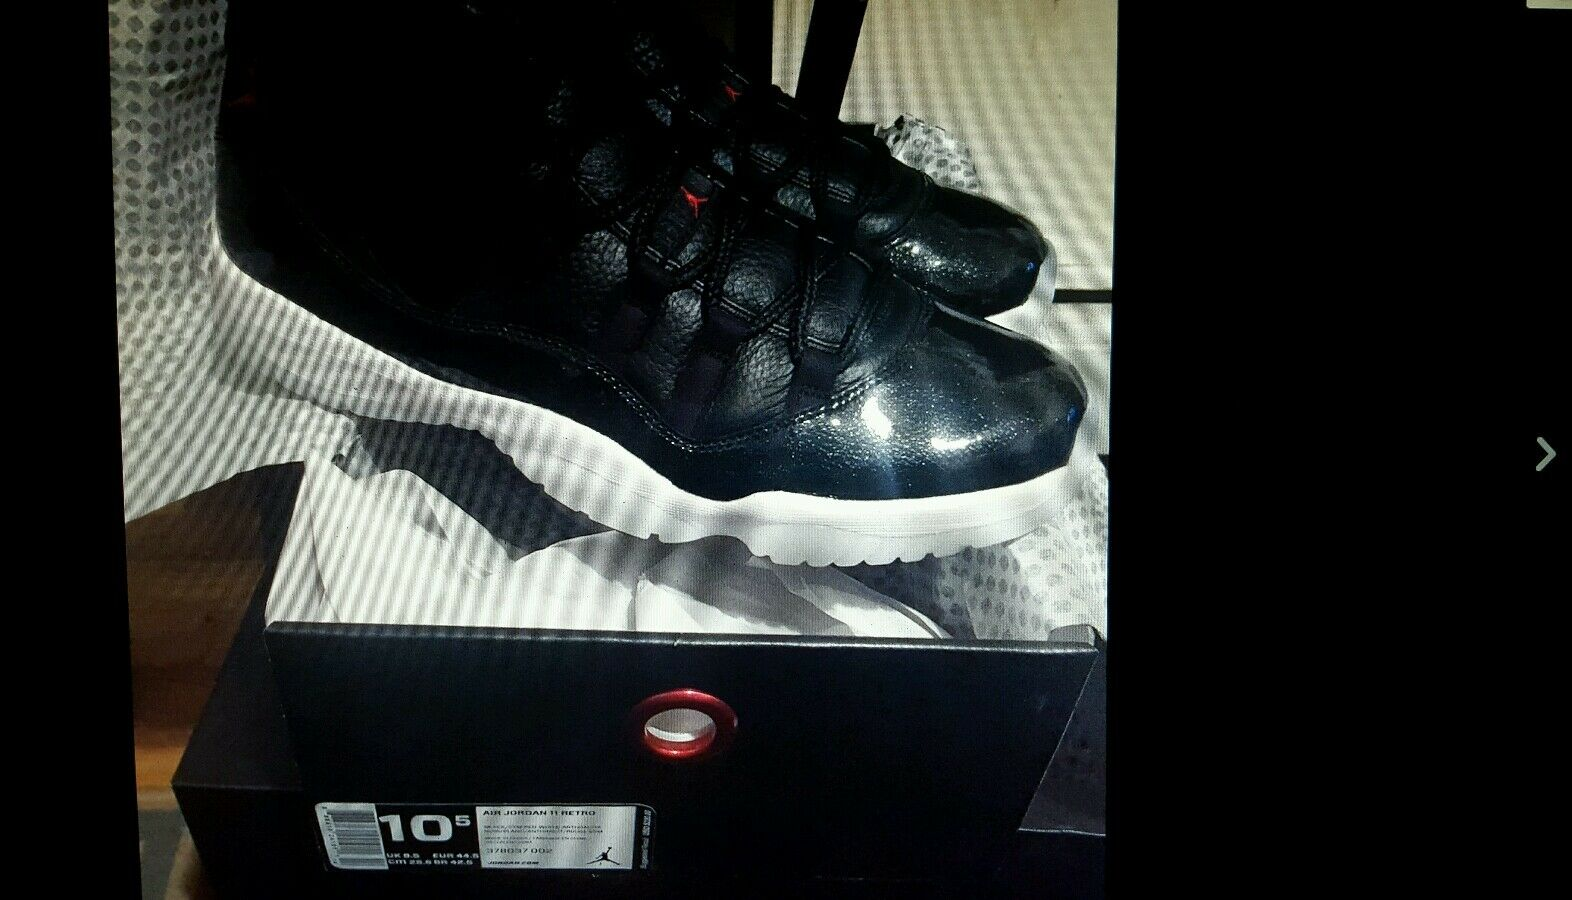 Nike Air Jordan 11 Size 10.5 72-10 Bred Retro 11